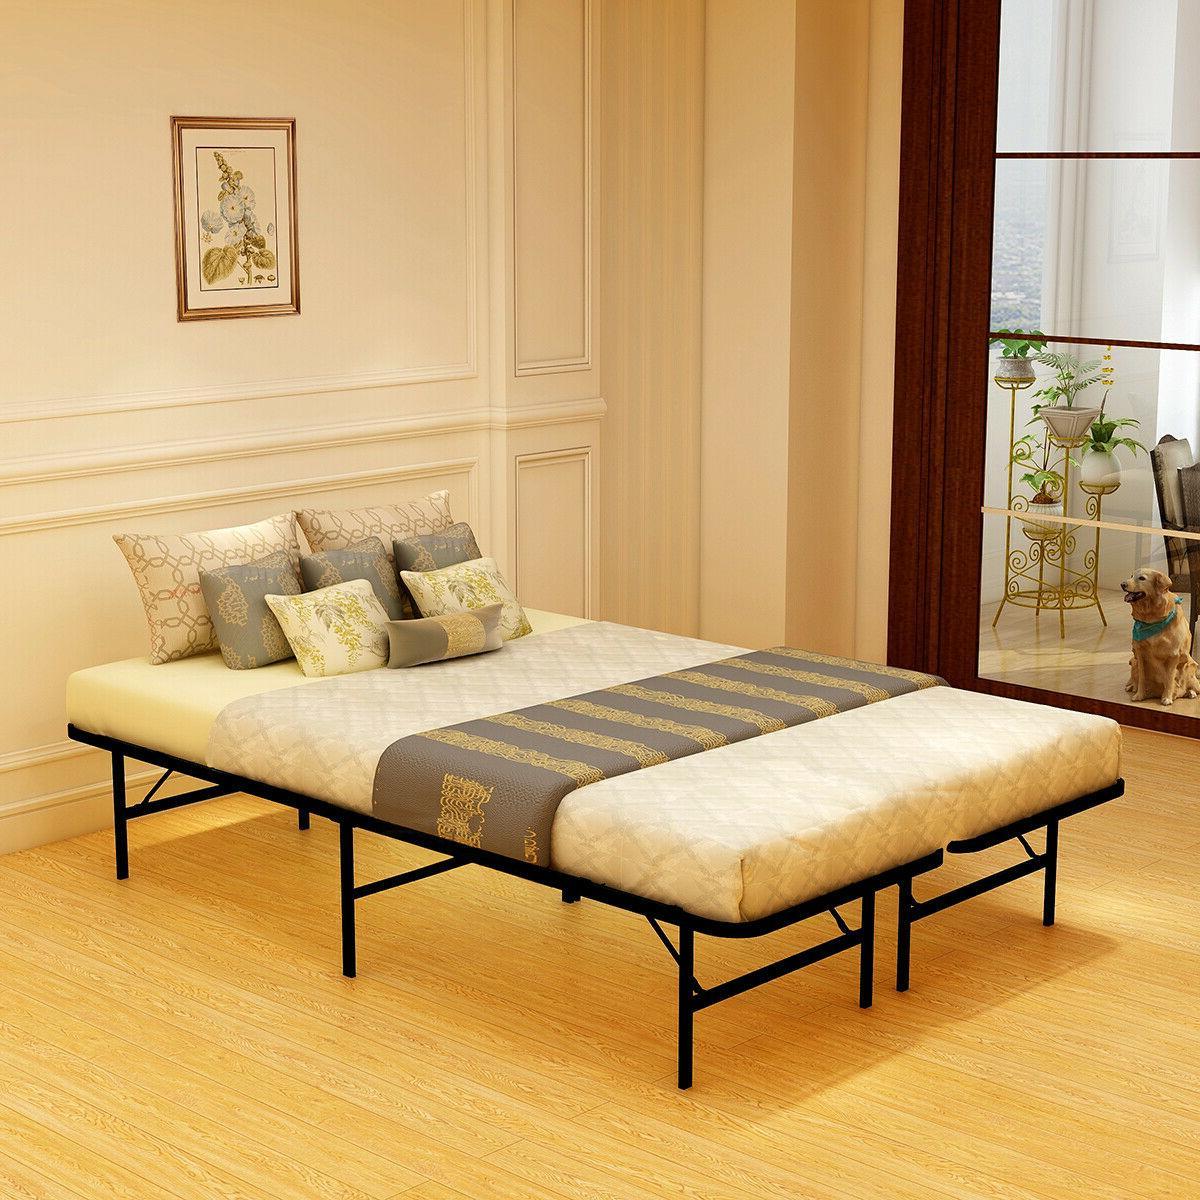 Twin/Full/Queen size Bed Frame Metal Platform Folding Heavy